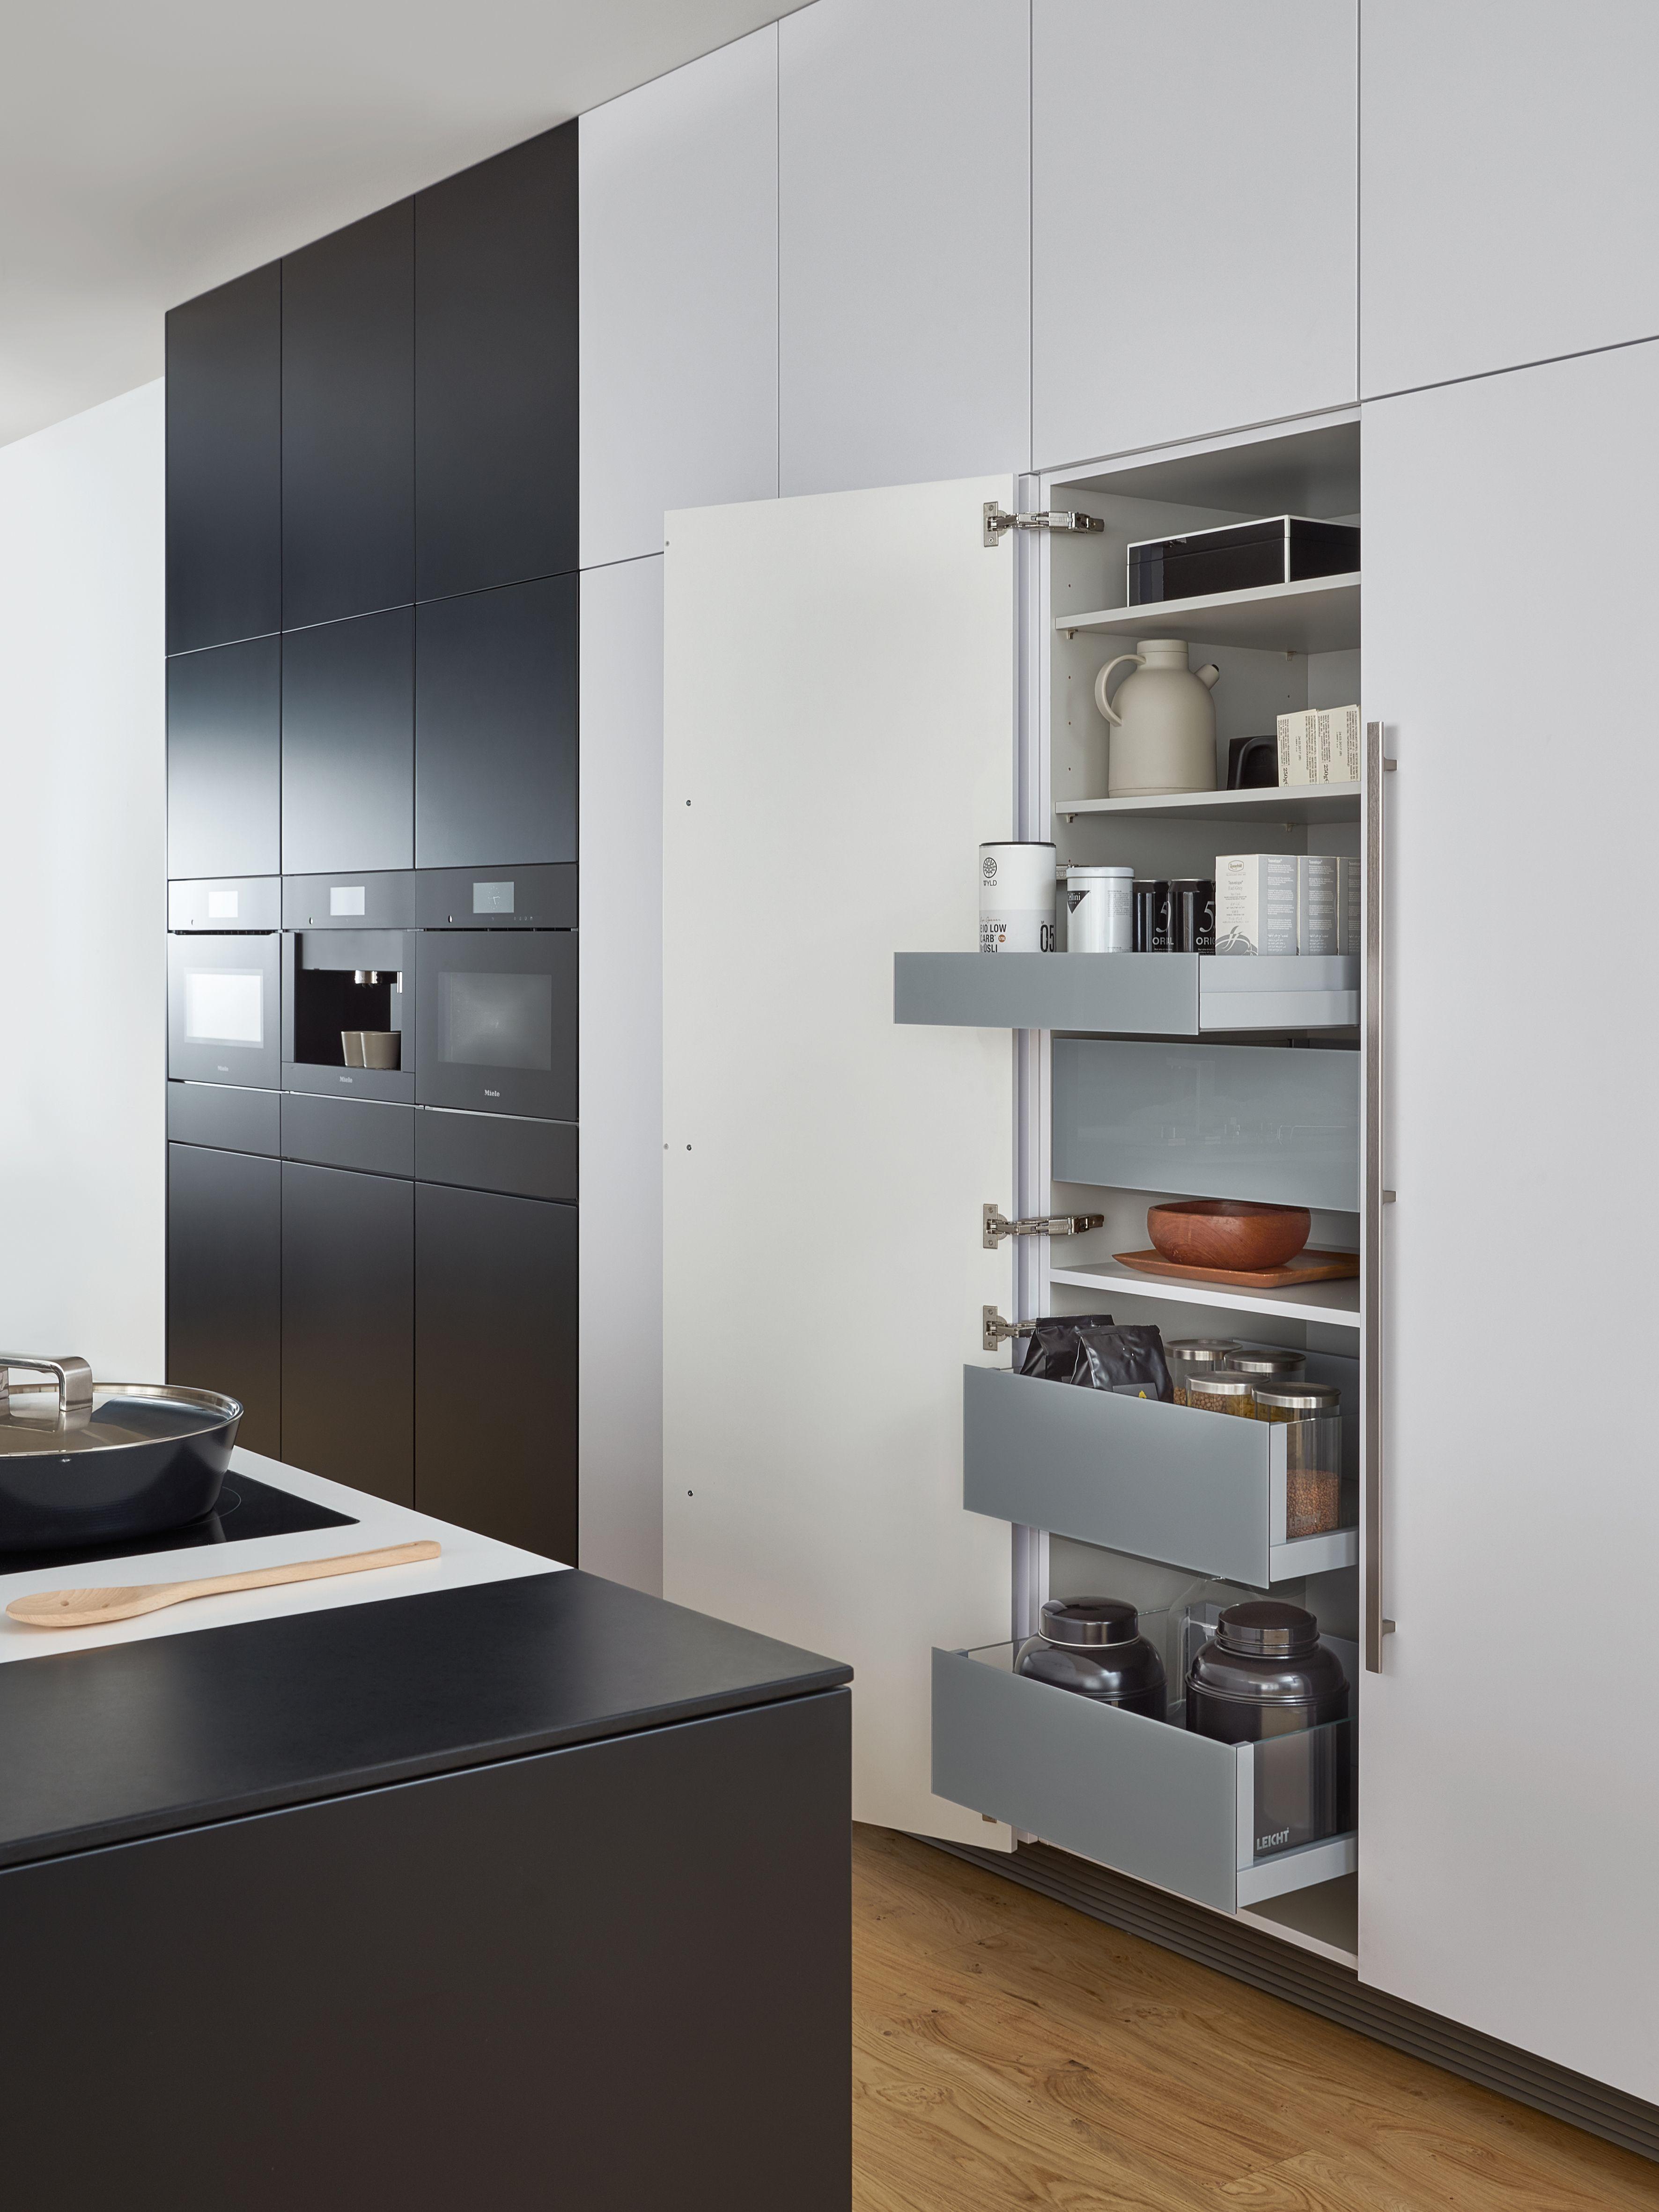 Küche Grau Mit Holz | gispatcher.com